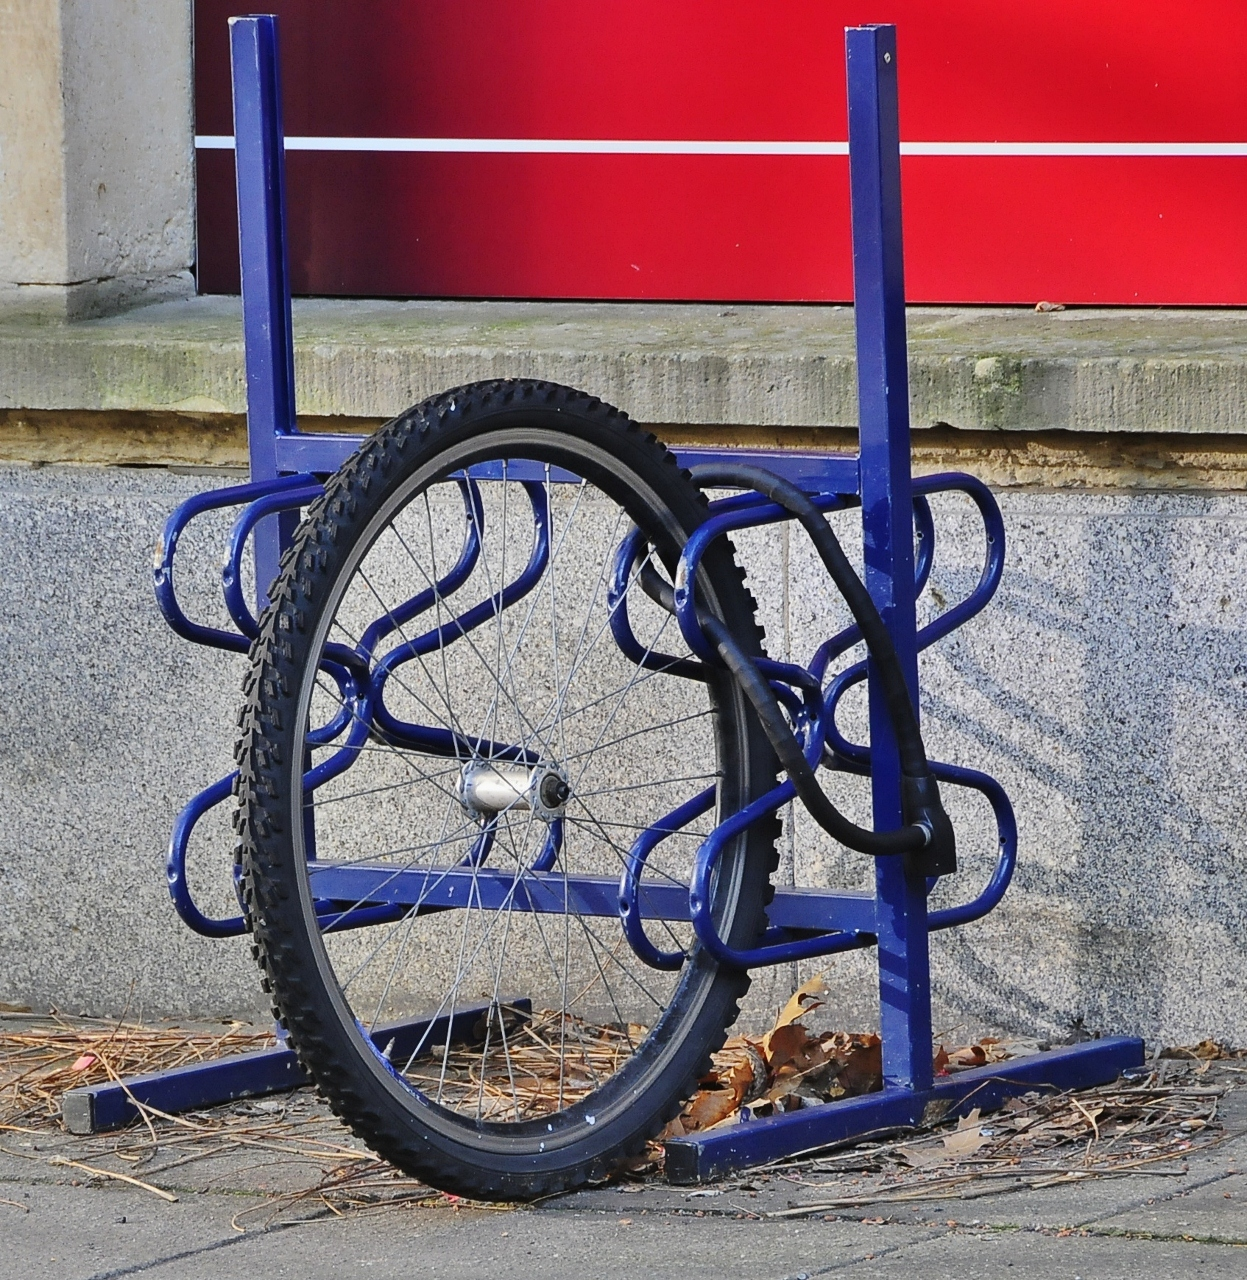 fahrrad blog dresden hilfe mein fahrrad ist weg. Black Bedroom Furniture Sets. Home Design Ideas